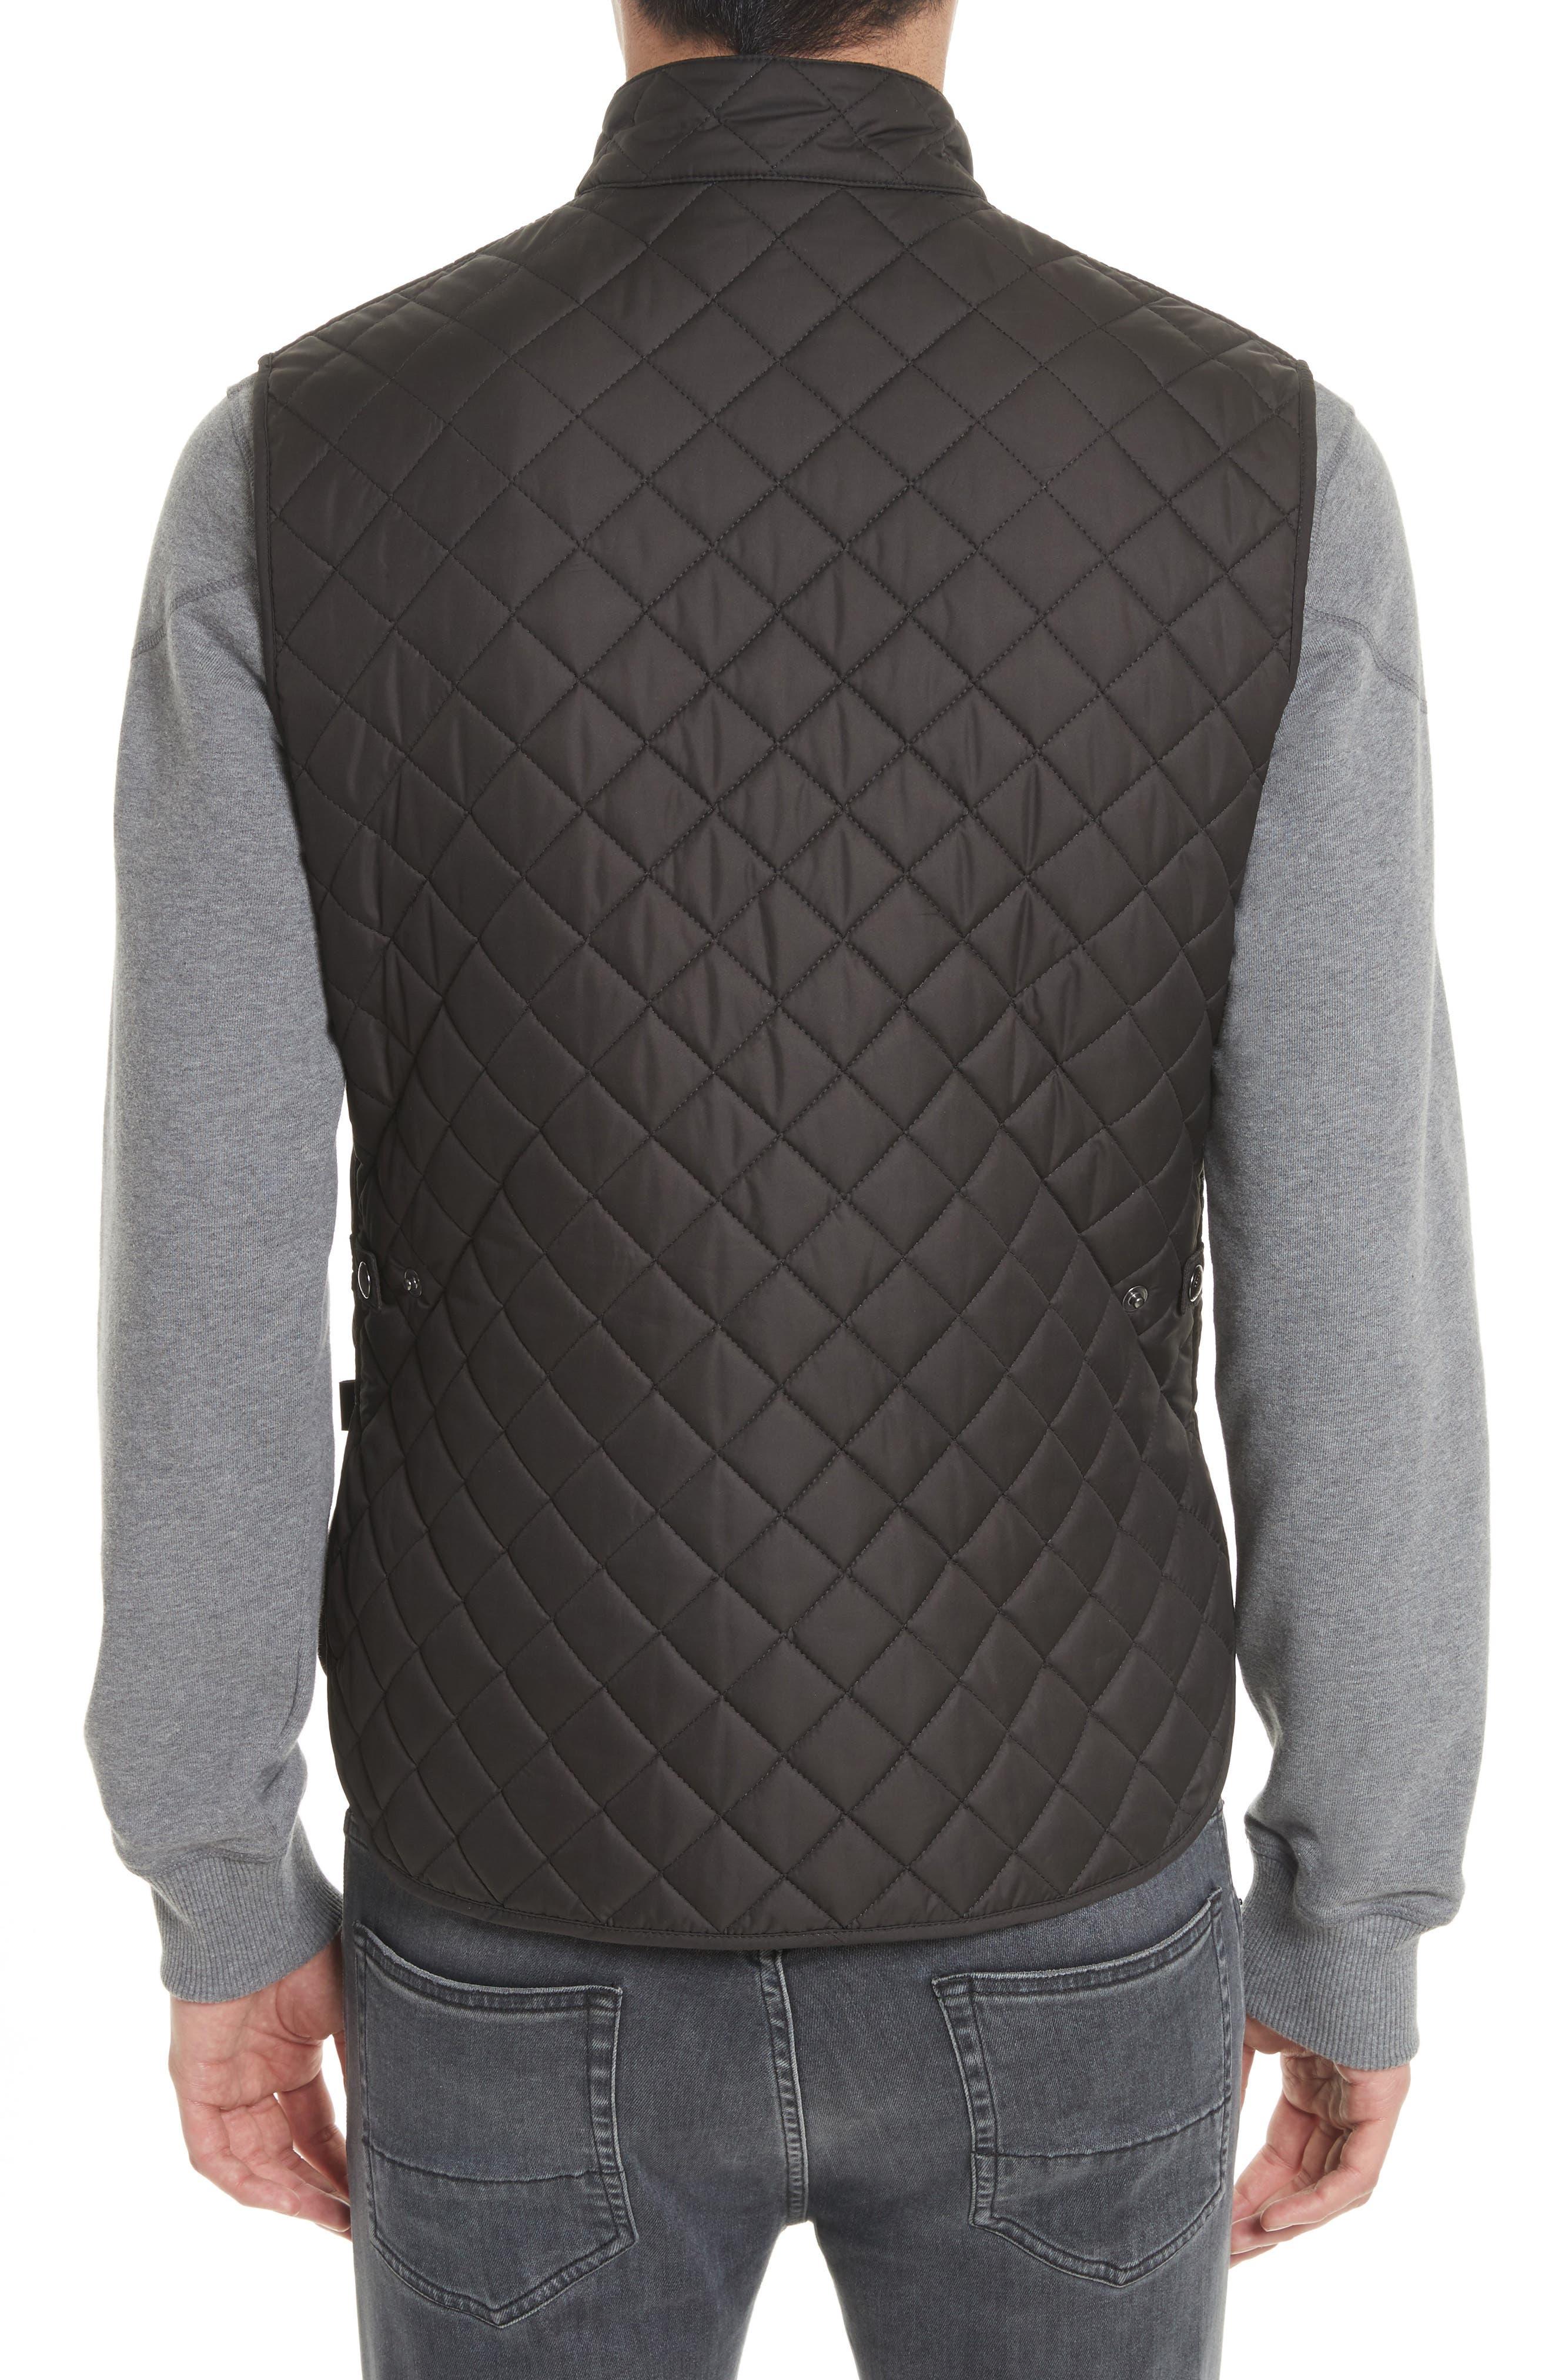 Waistcoat Tech Quilted Vest,                             Alternate thumbnail 2, color,                             Black